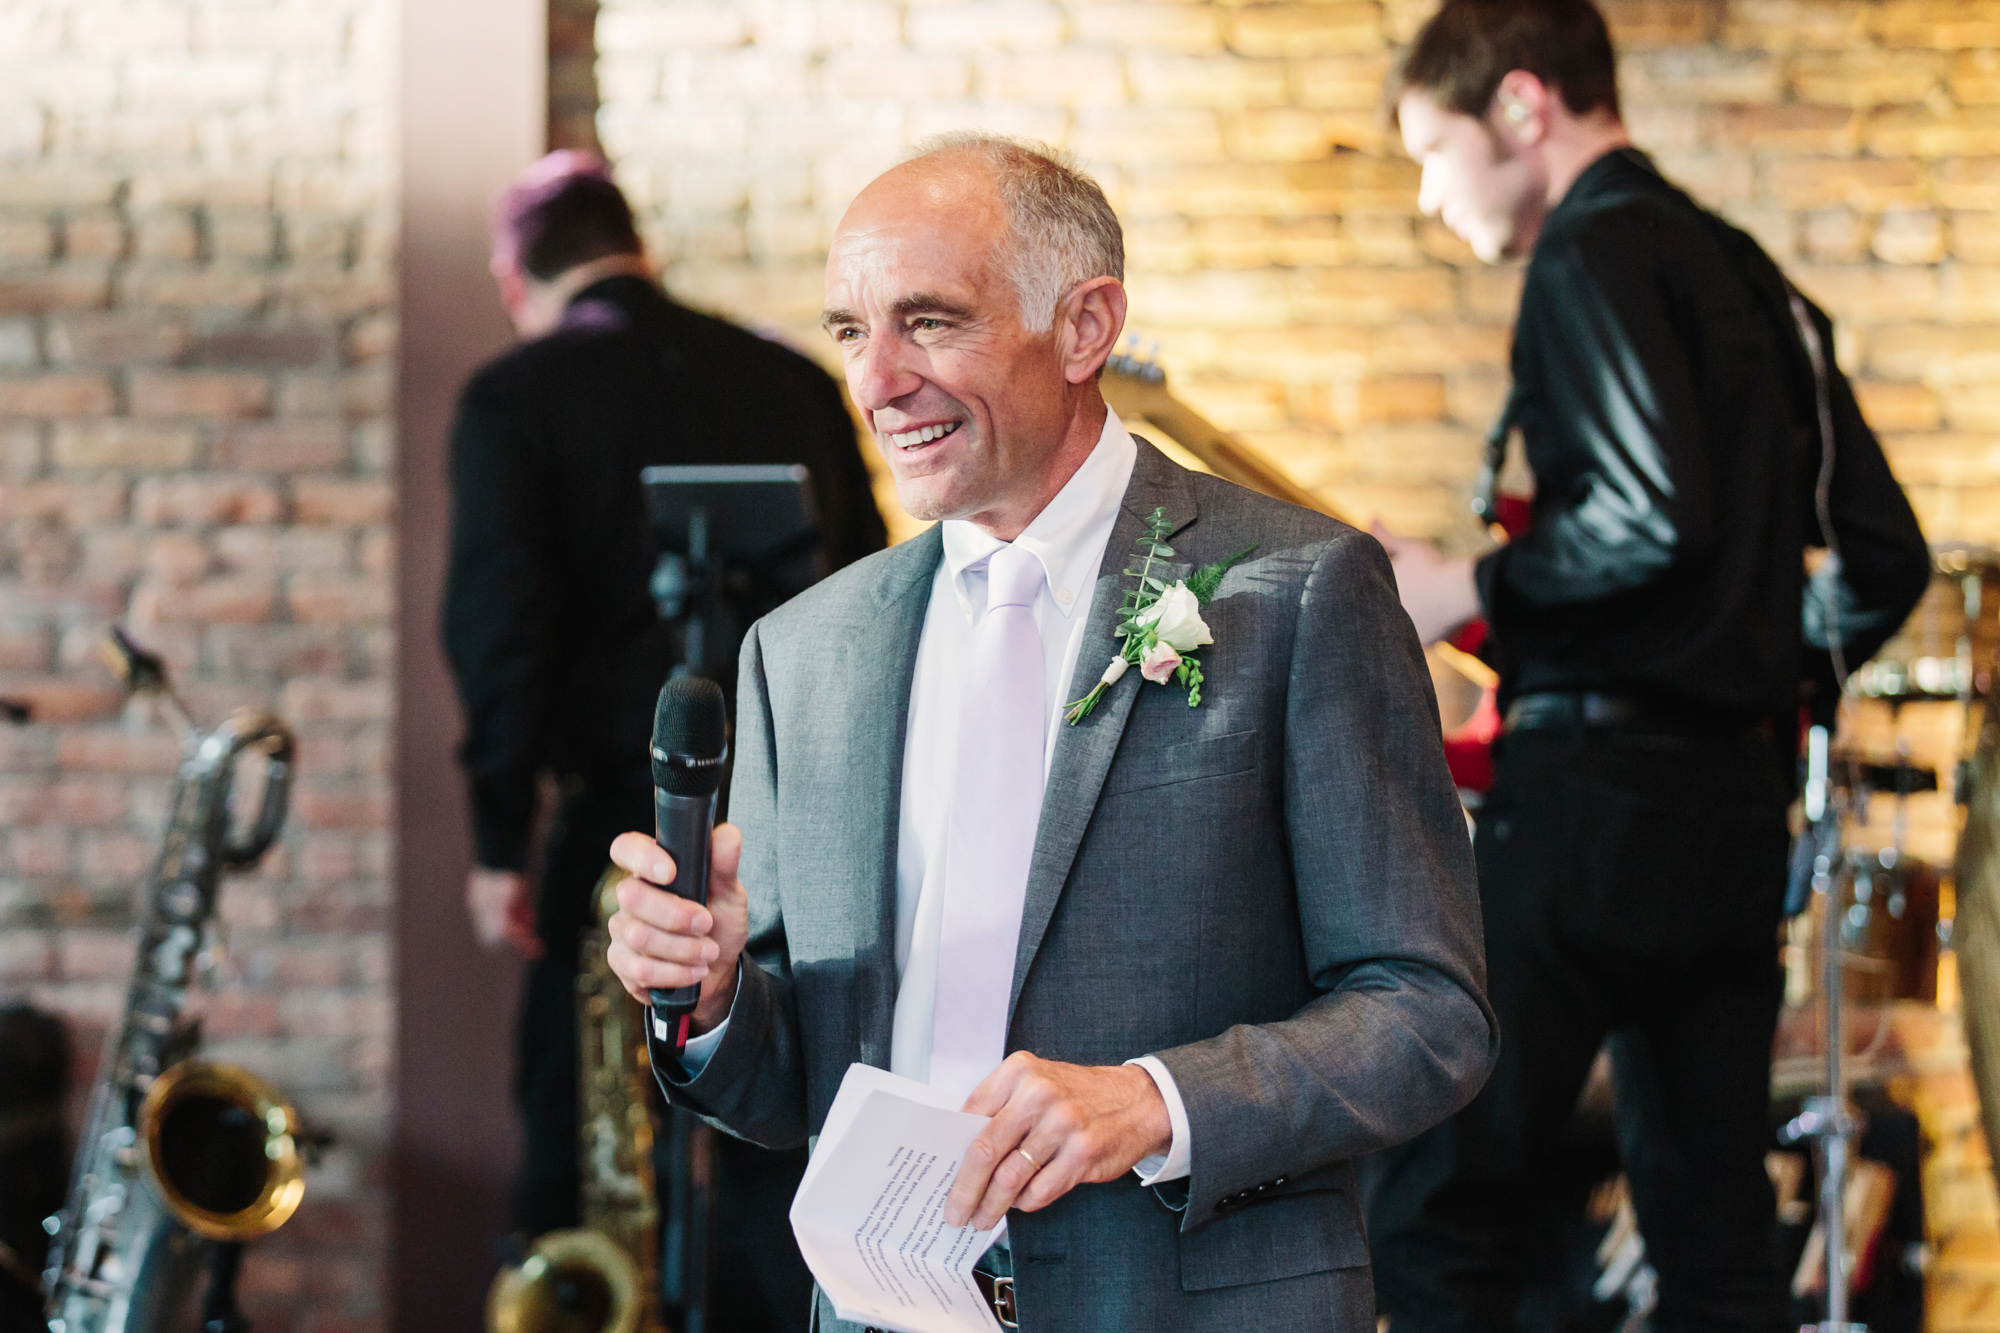 69_Rowan_Brian_The_Roundhouse_Wedding_Beacon_NY_Tanya_Salazar_Photography_737.jpg